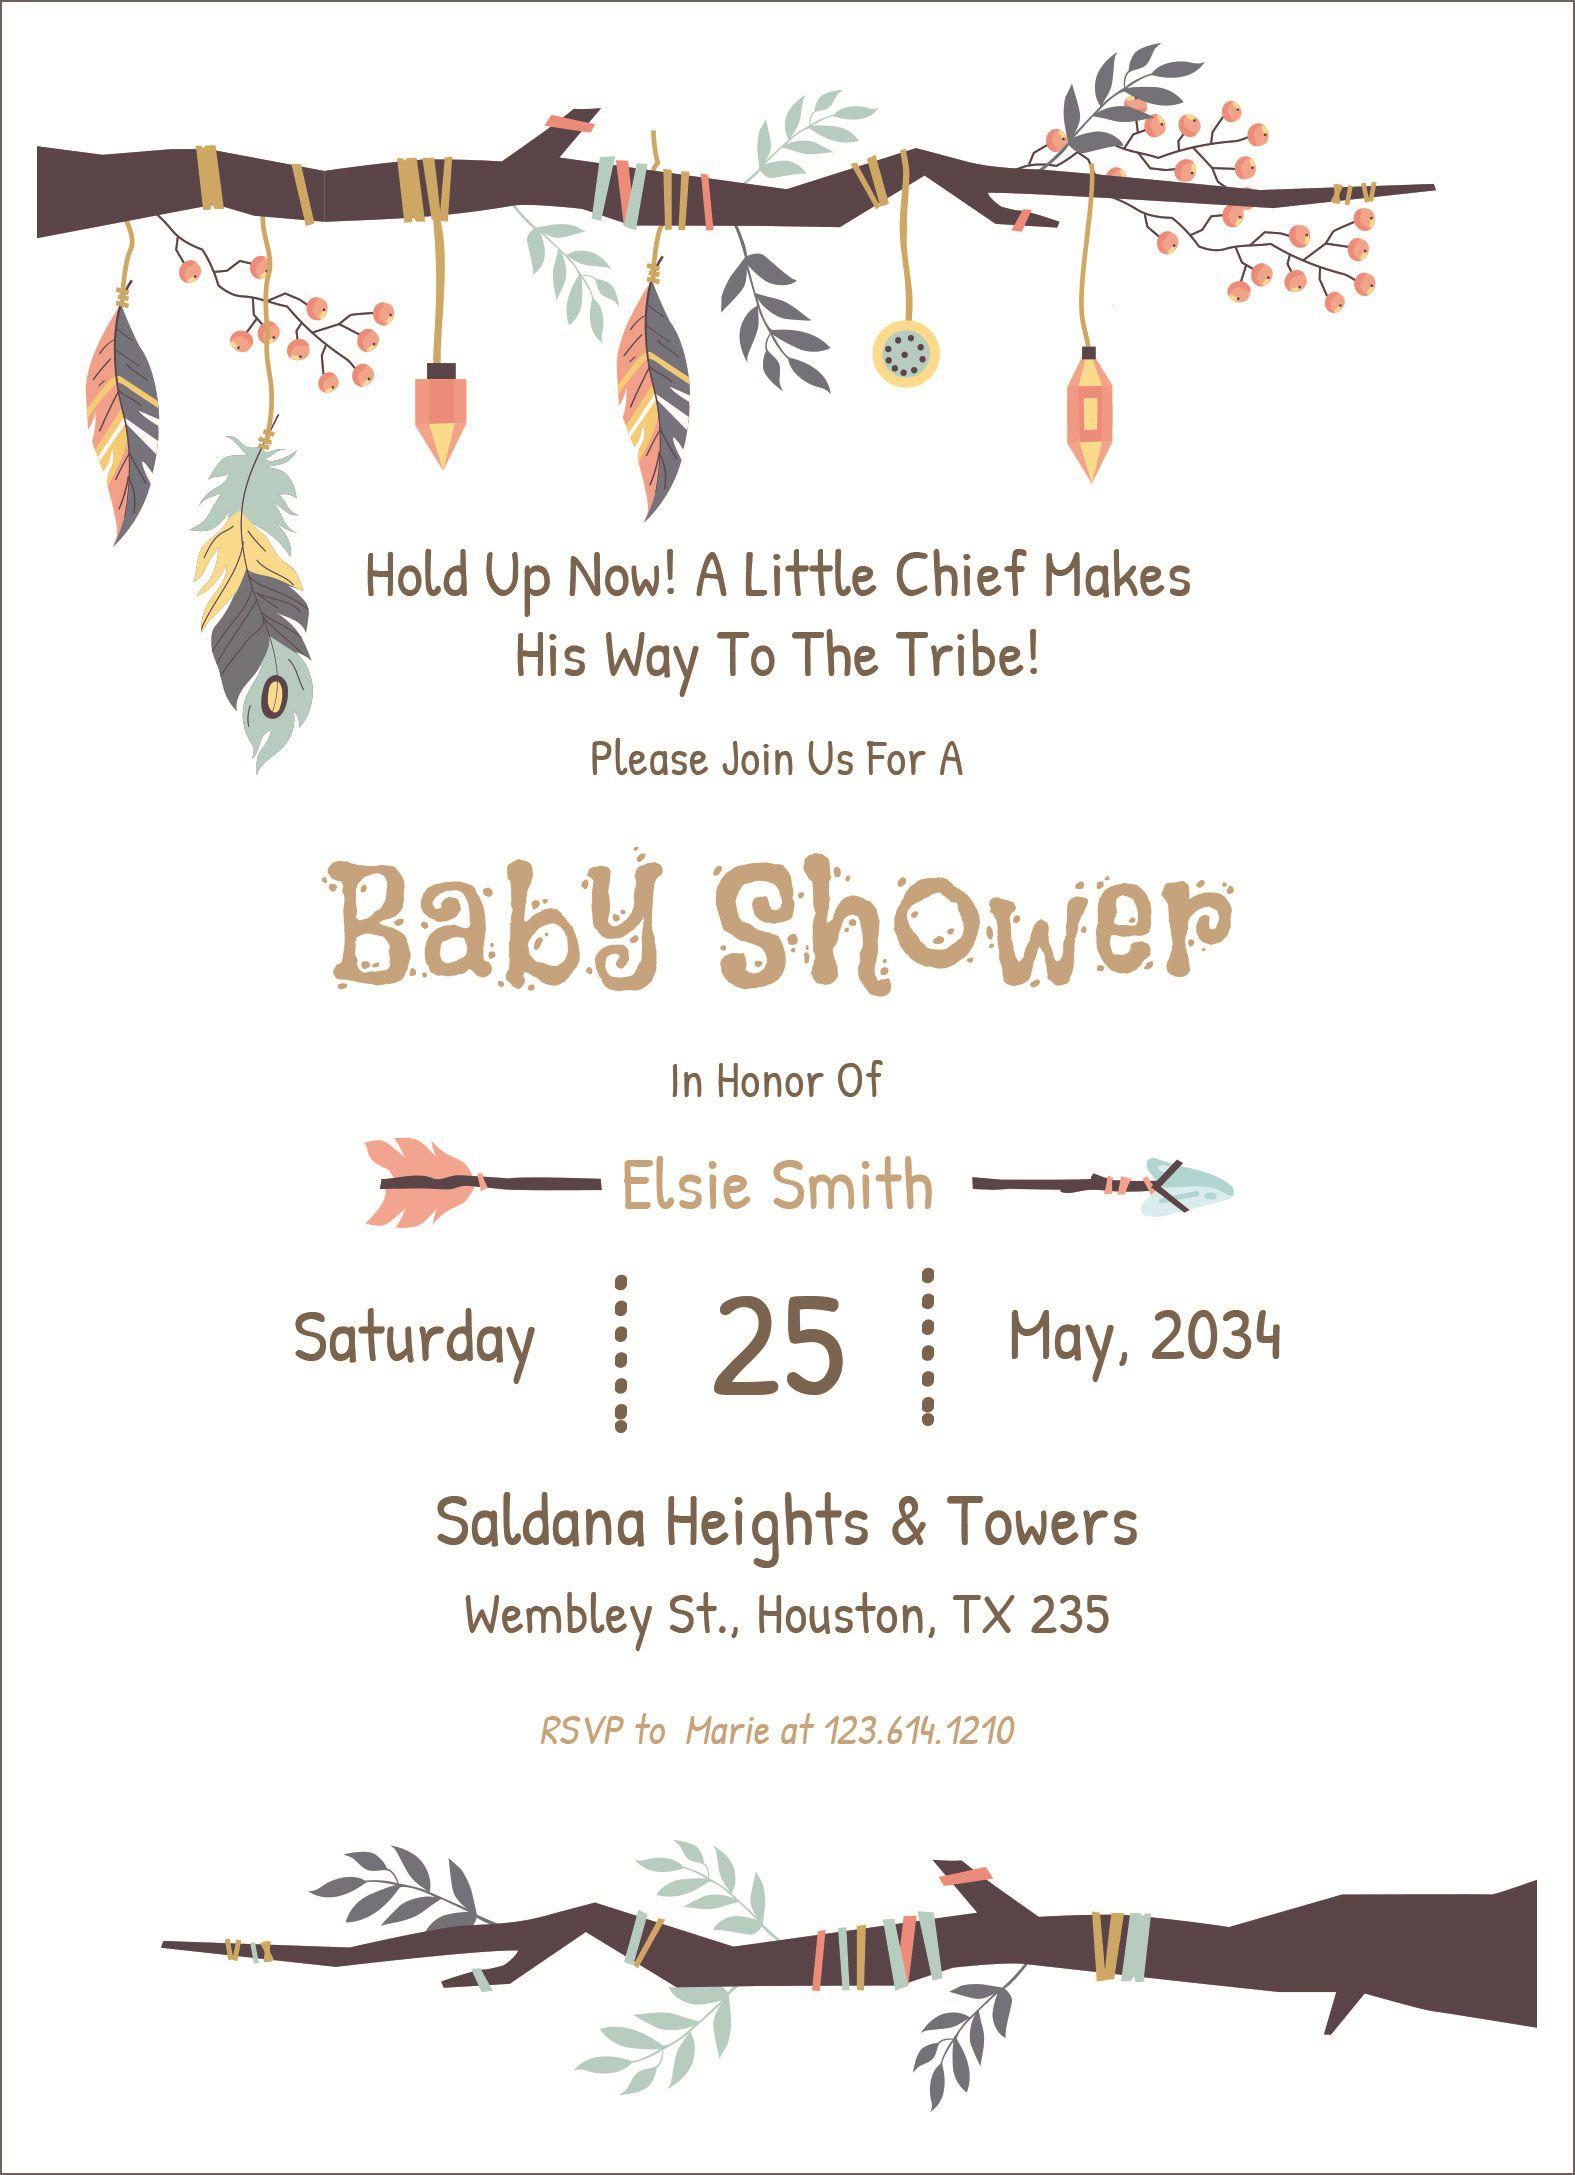 002 Wondrou Baby Shower Invitation Free Template Design  Templates Online Printable E-invitation Card DownloadFull